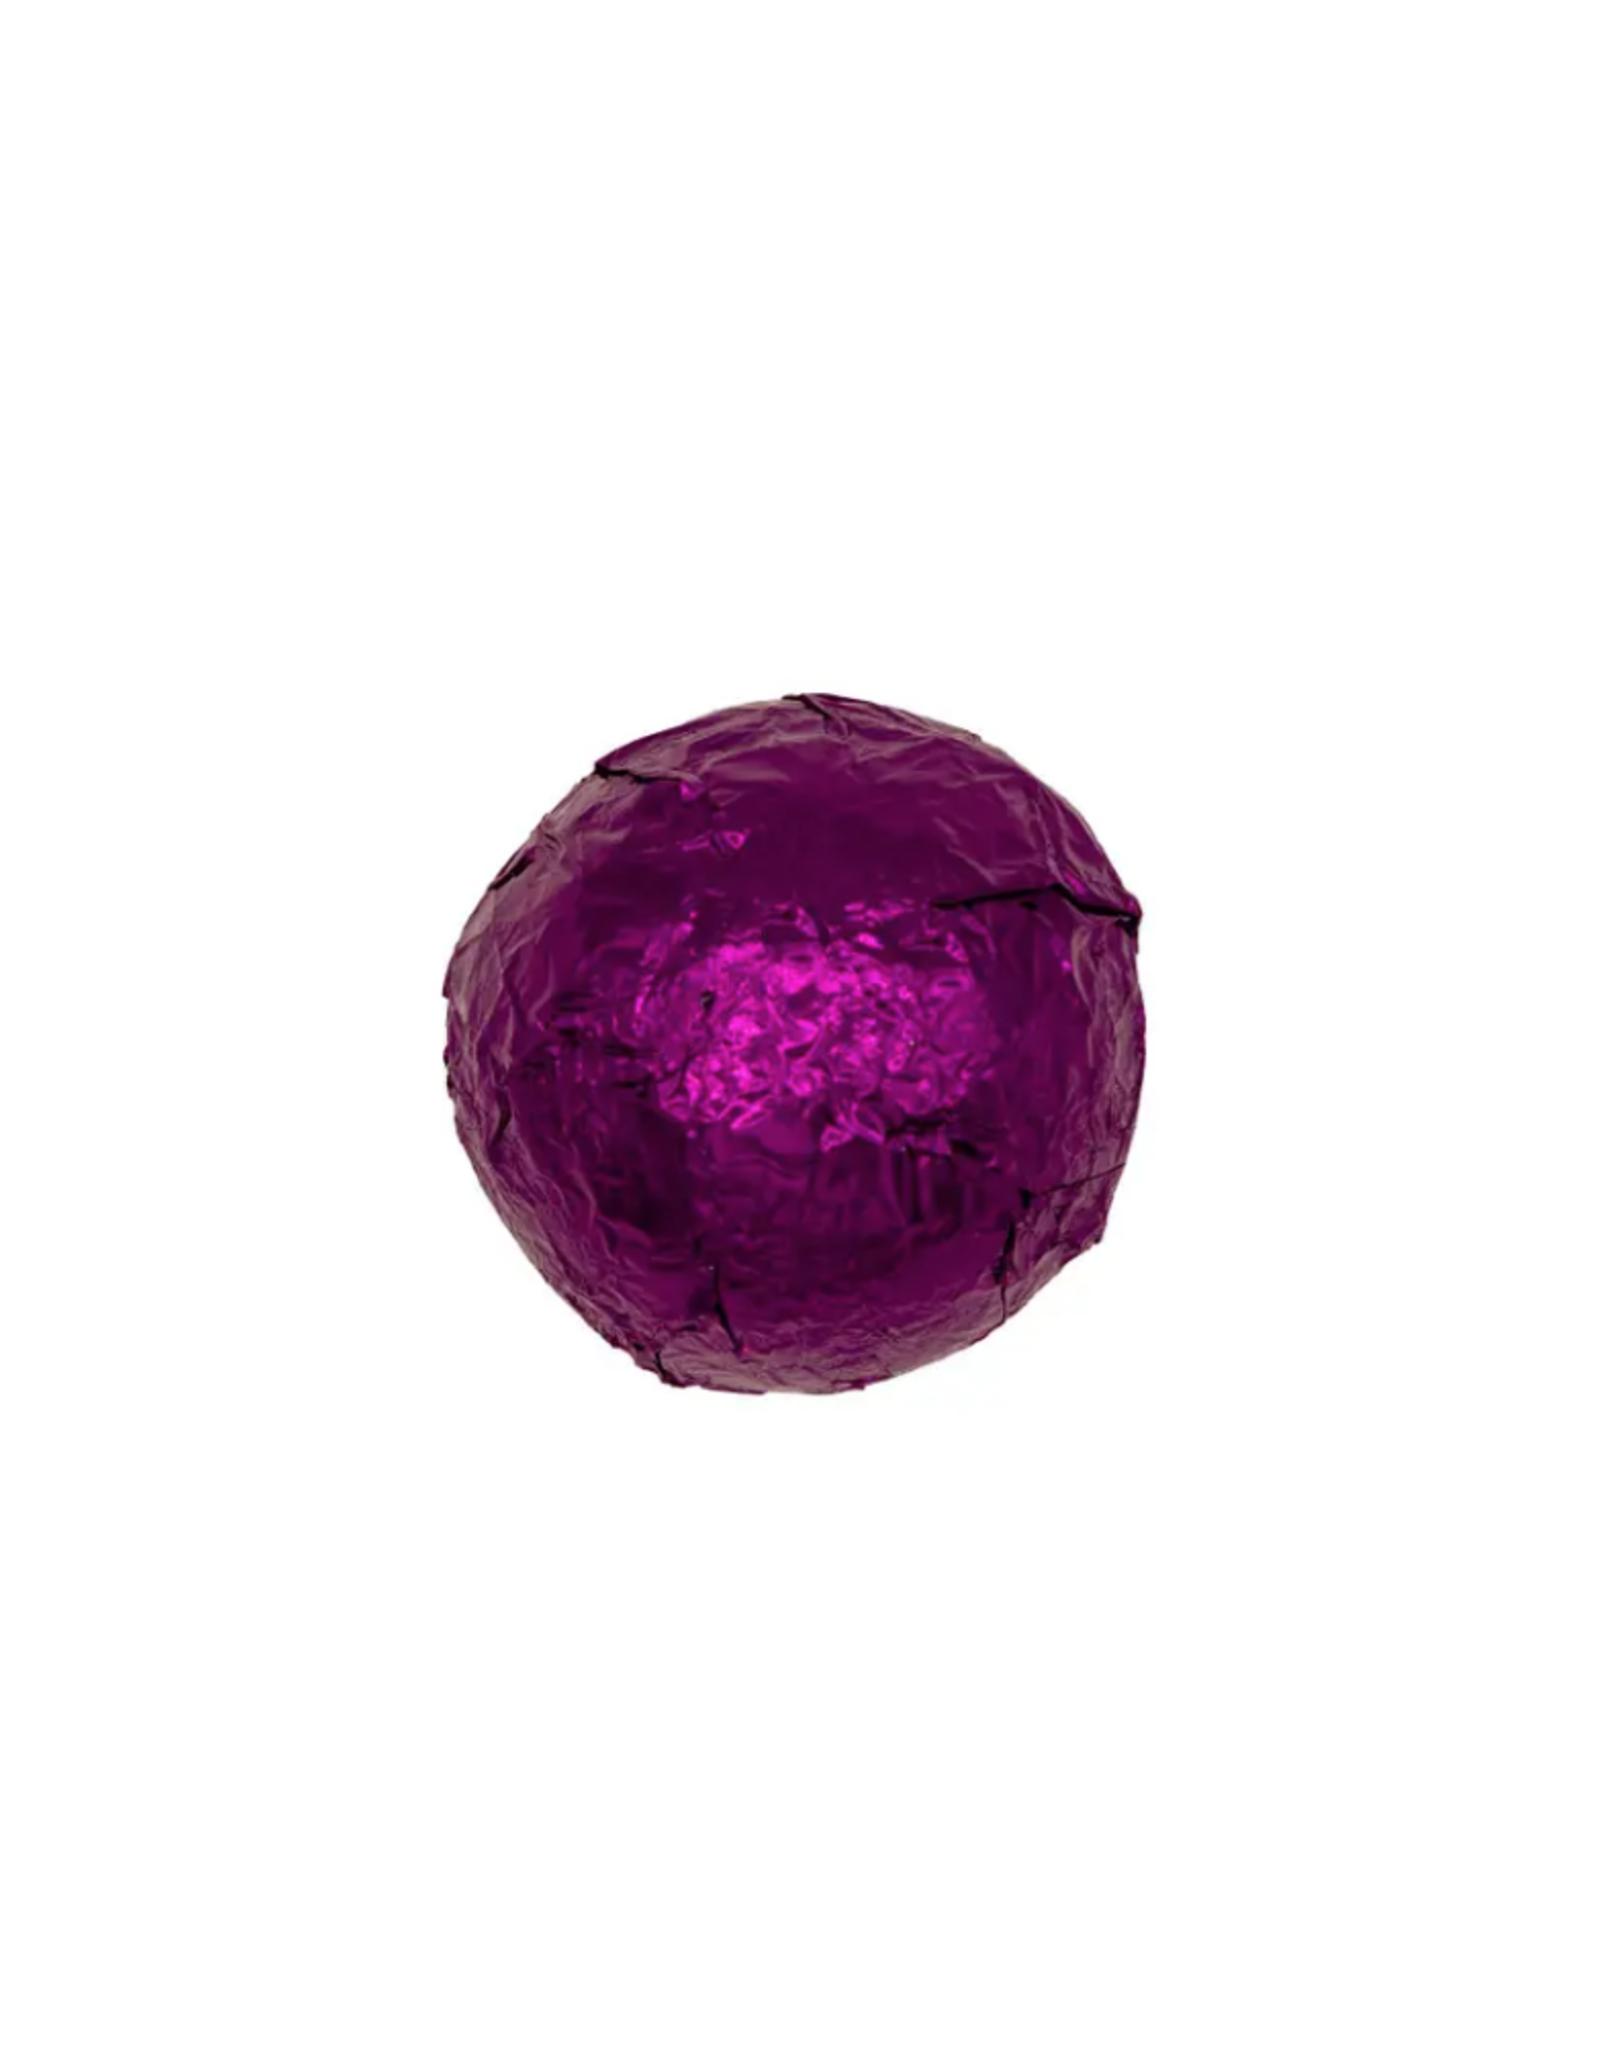 Garb2art Garb2art - Shower Bomb - Lavender